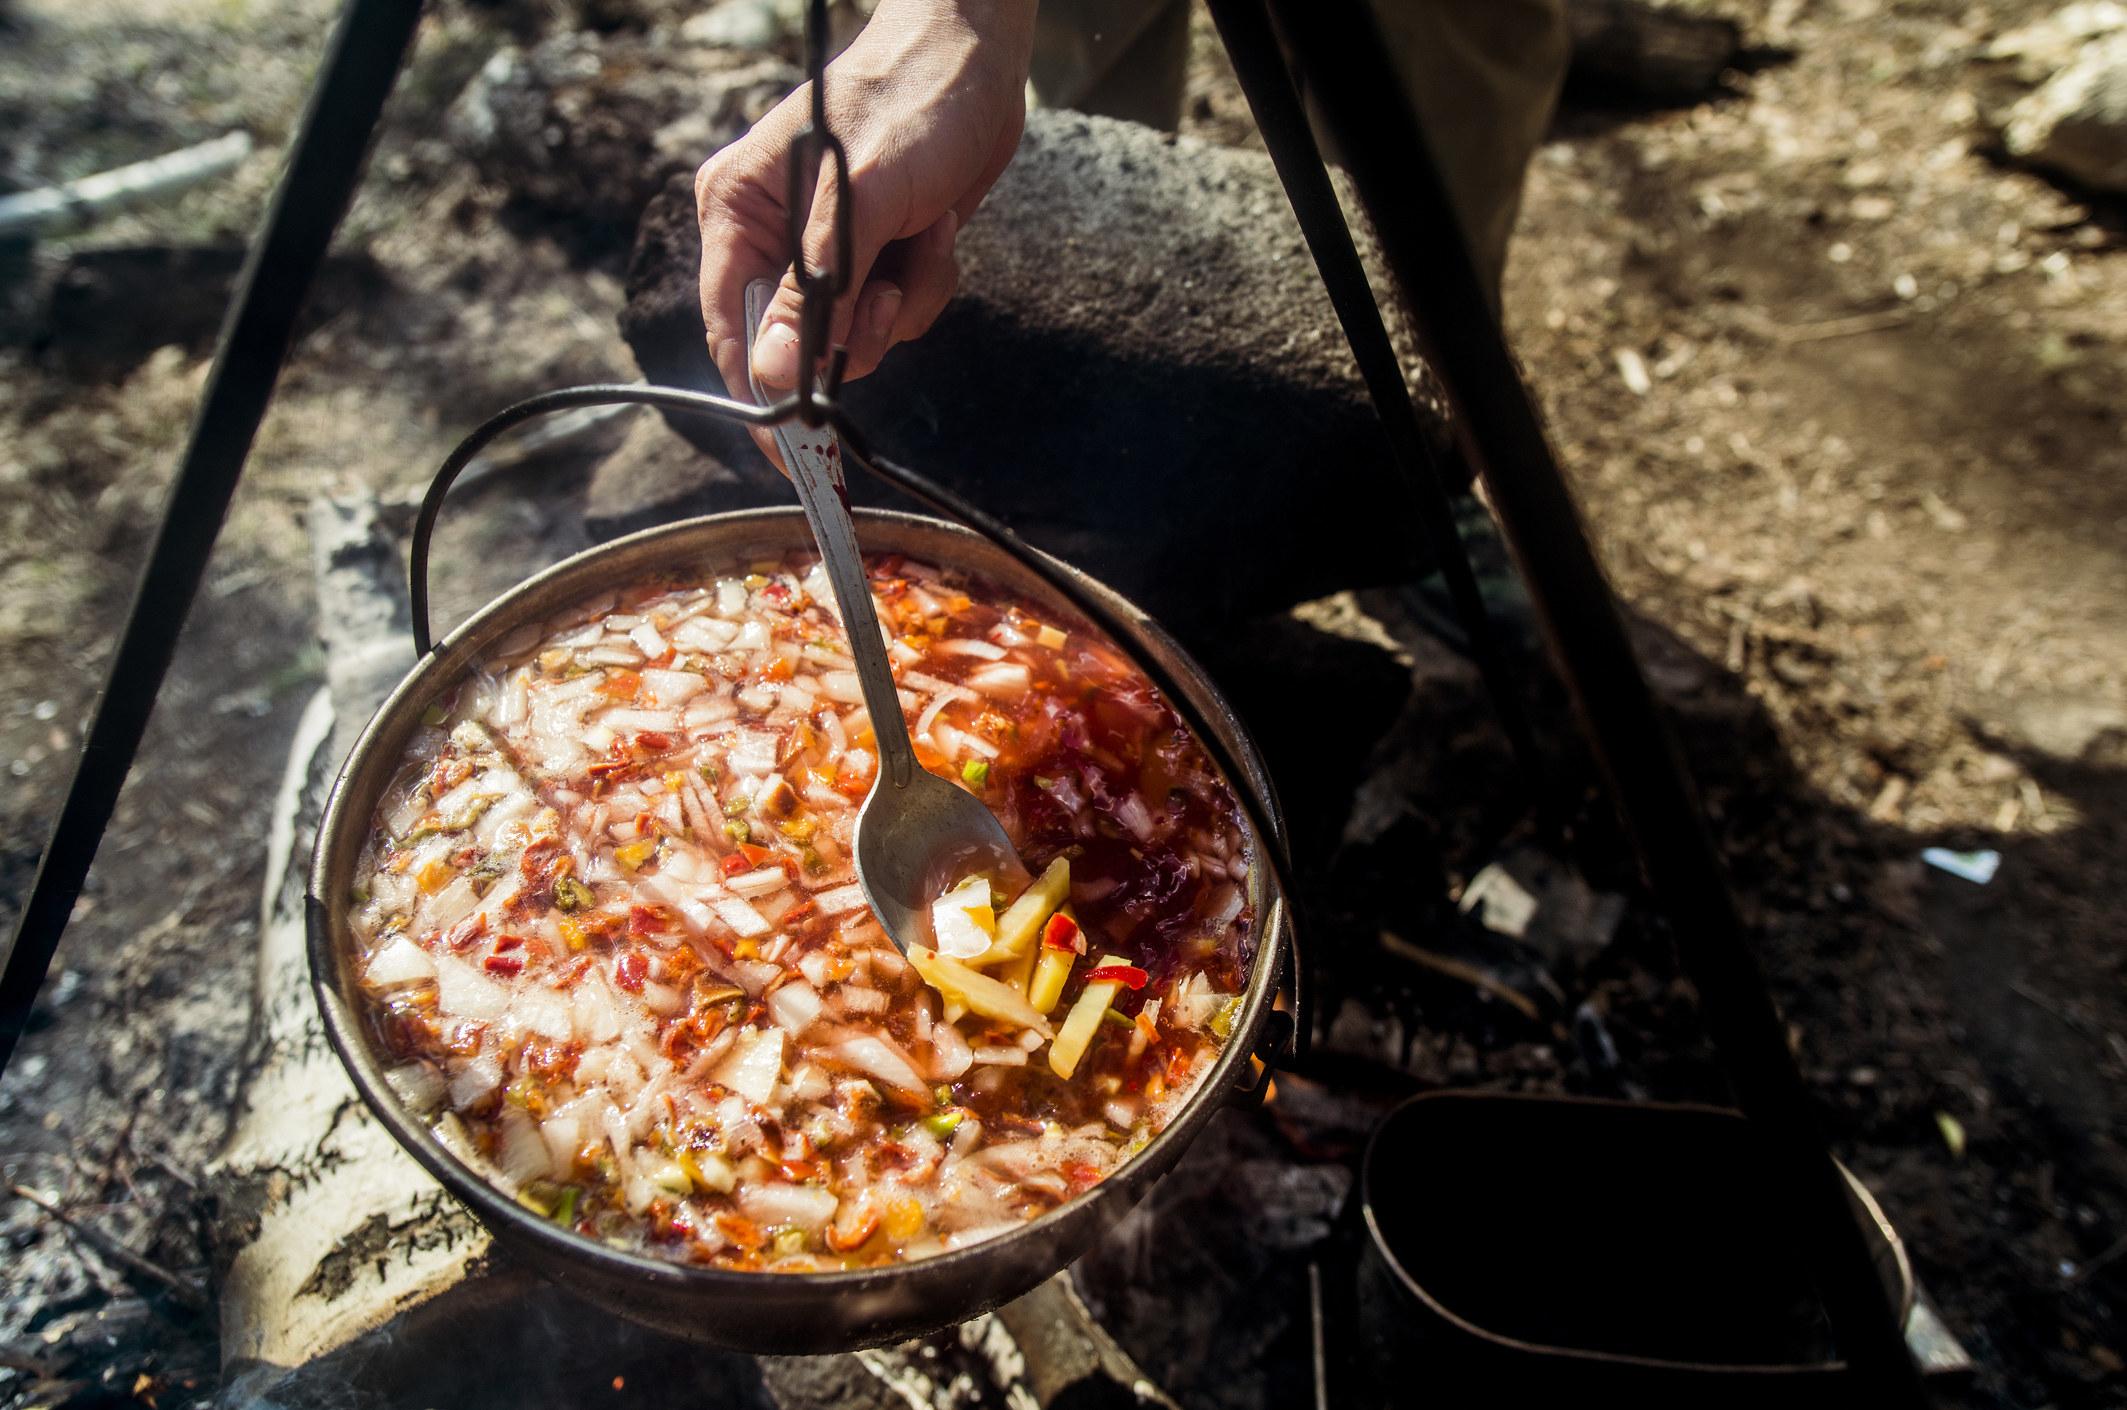 Stirring a pot of soup over a campfire.